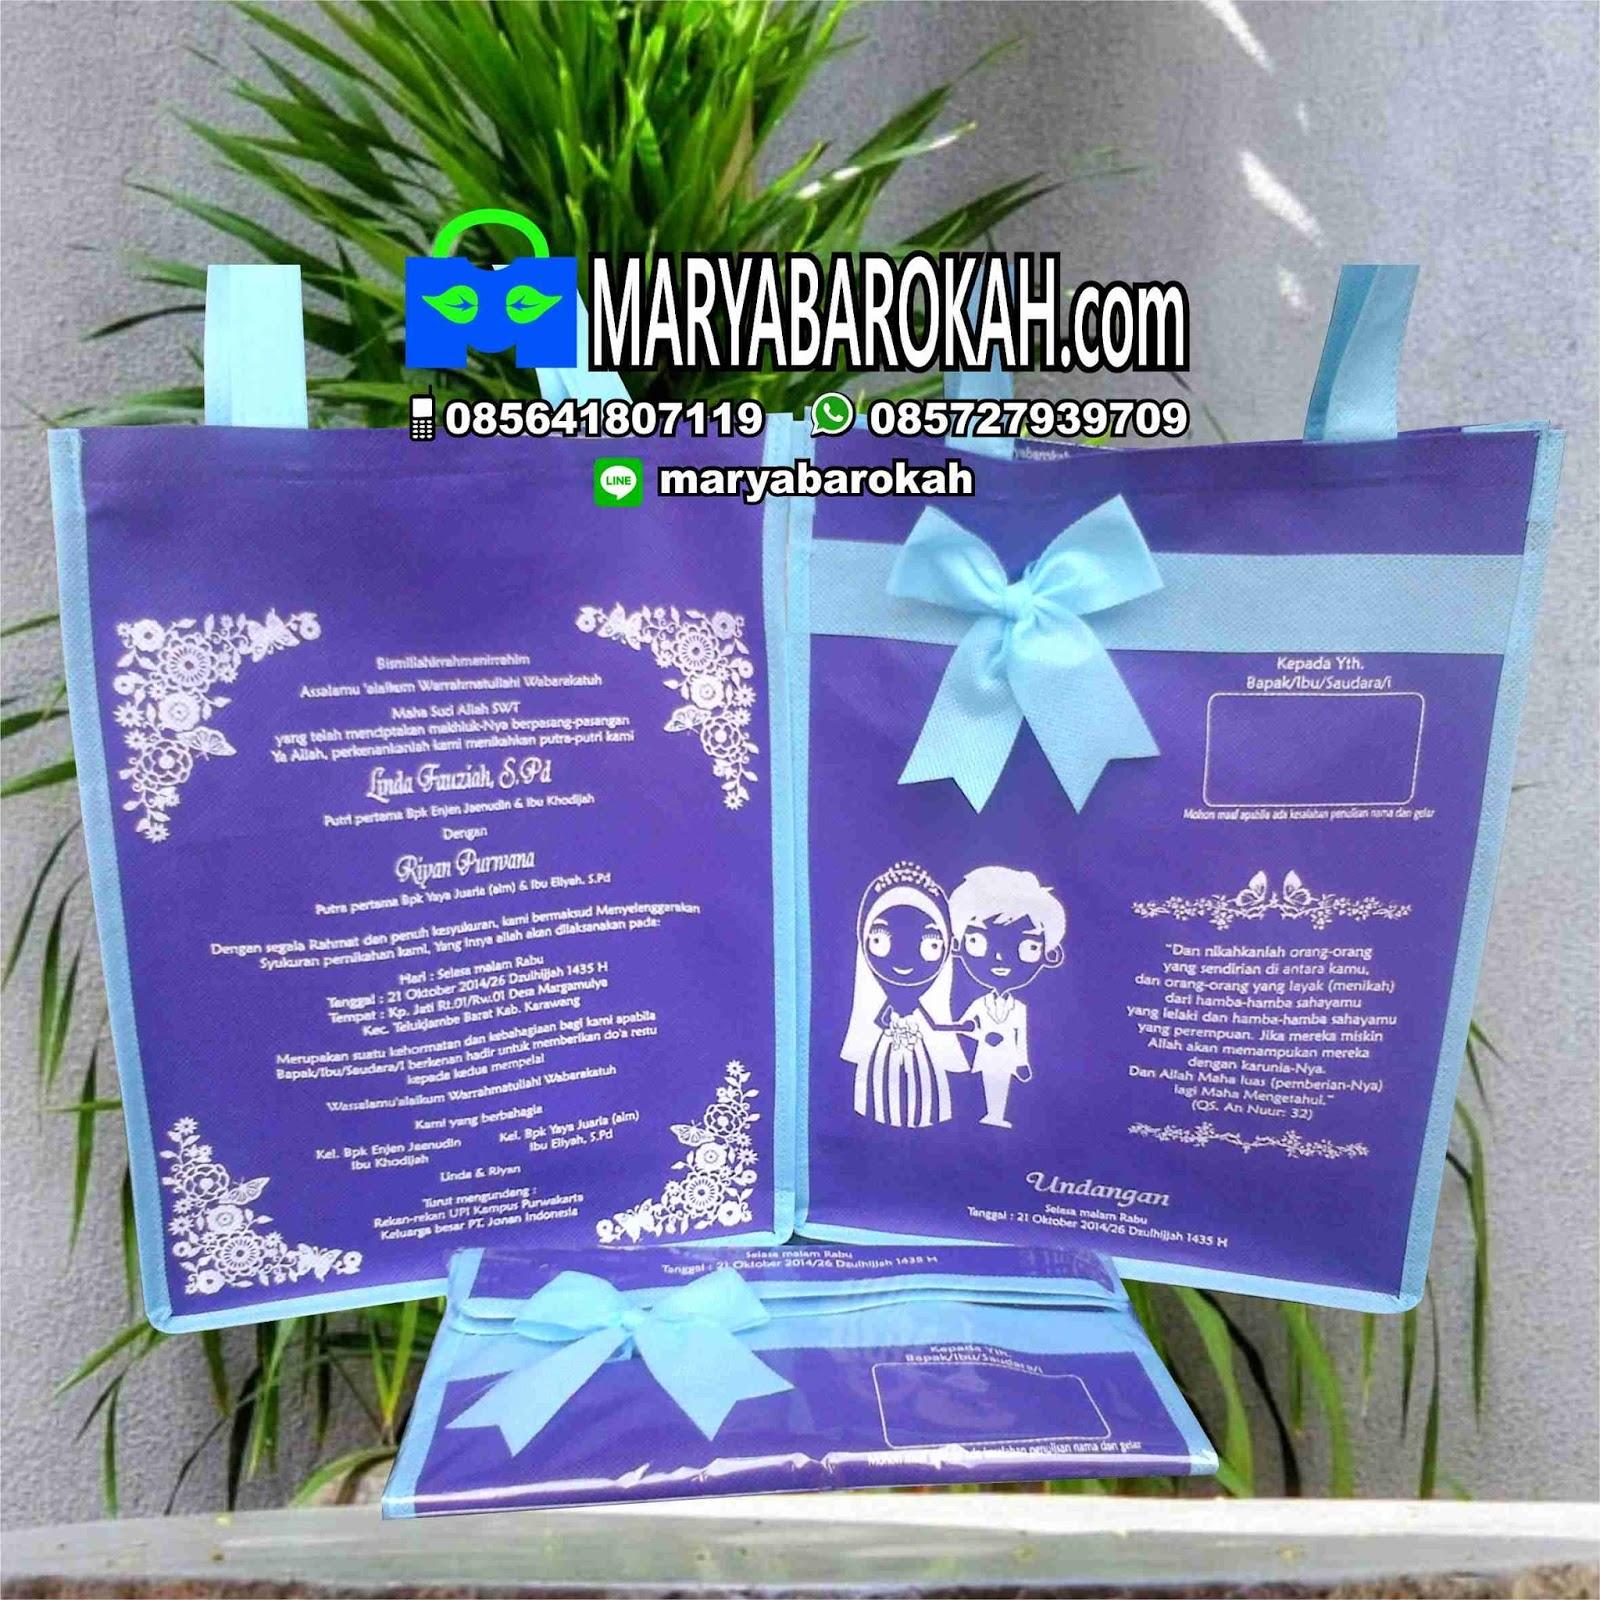 Undangan Pernikahan Unik Dan Bermanfaat Produsen Undangan Tas